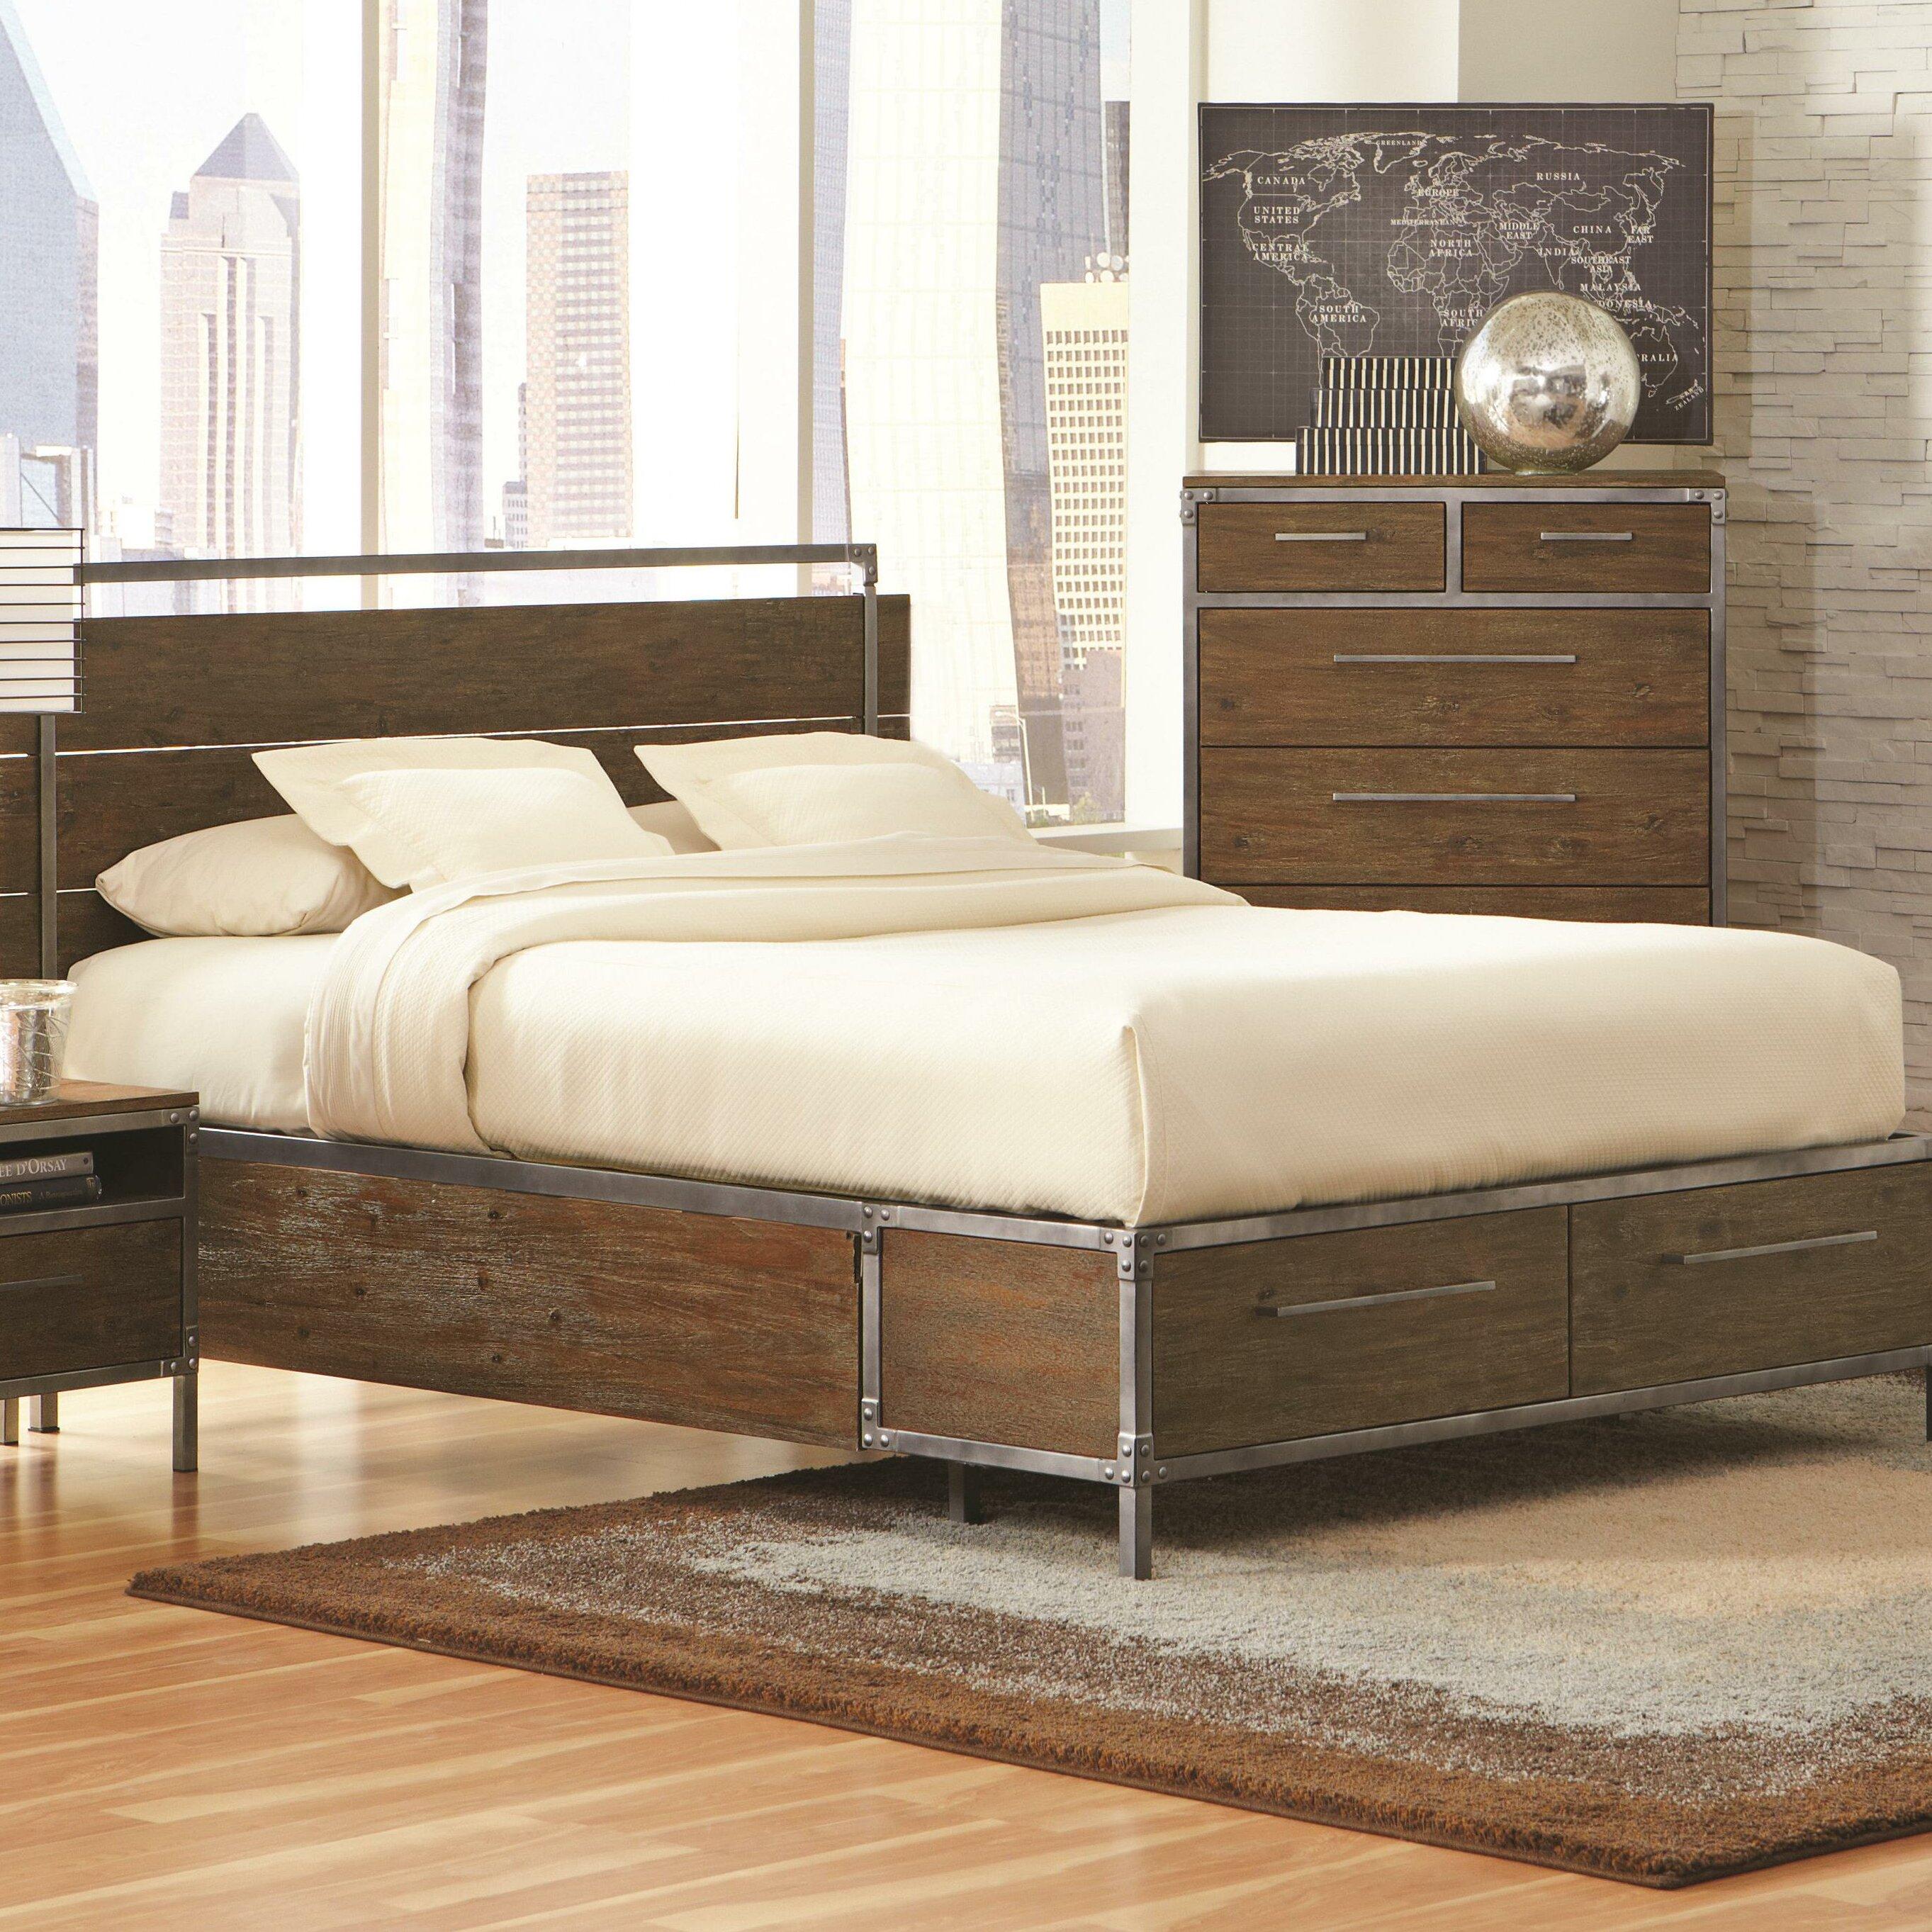 Wildon Home Arcadia Storage Platform Bed Reviews Wayfair